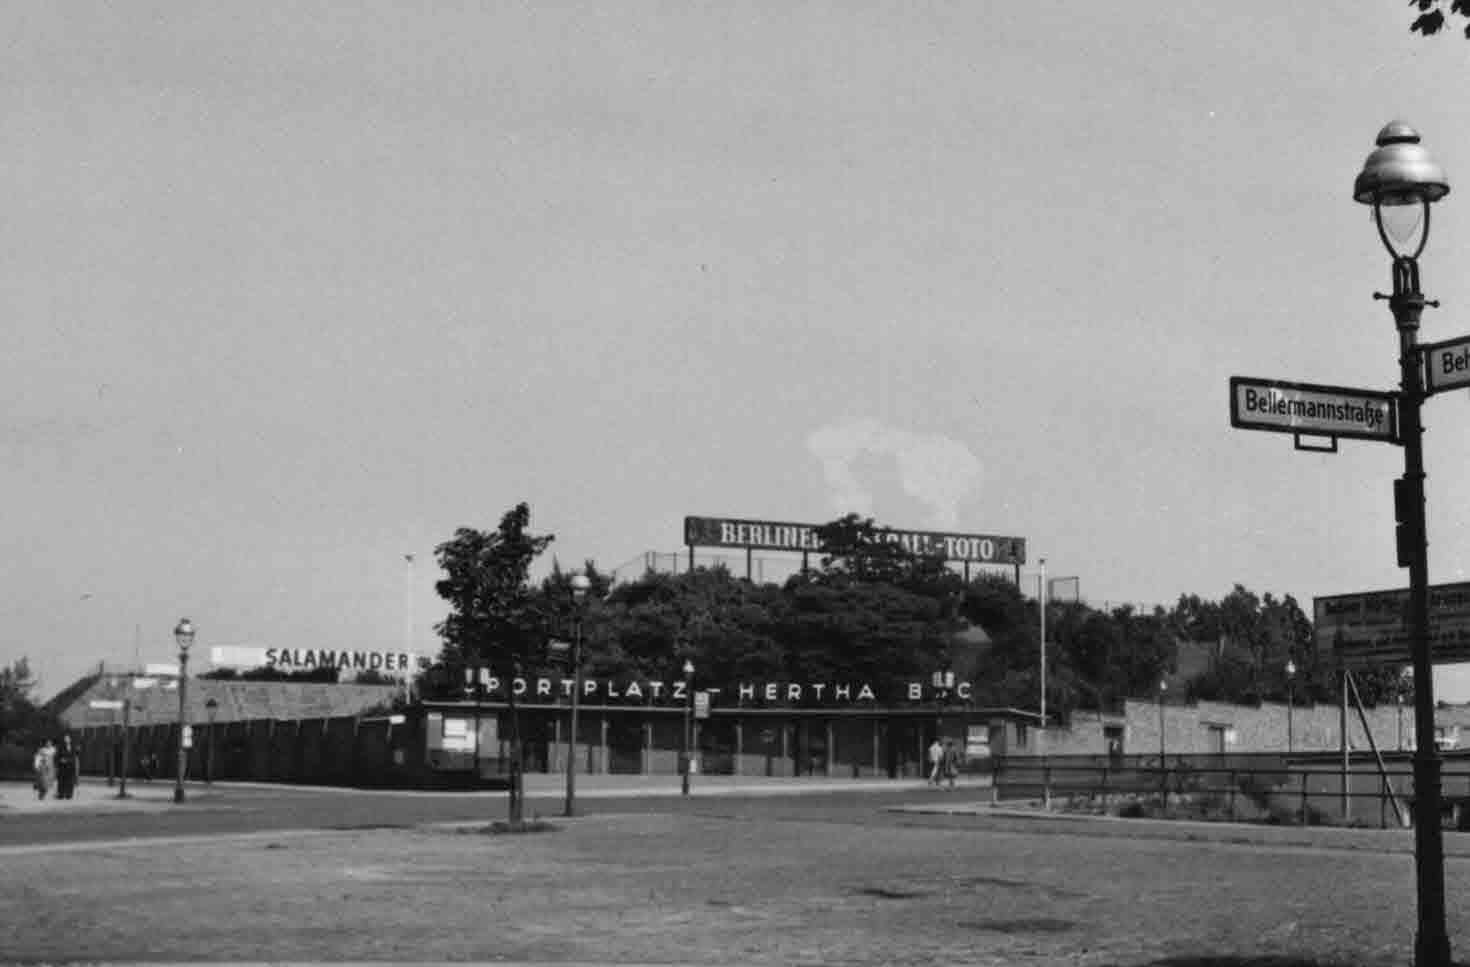 Eingang Hertha Sportplatz um 1955. Foto Ralf Schmiedecke Sammlung Berlin